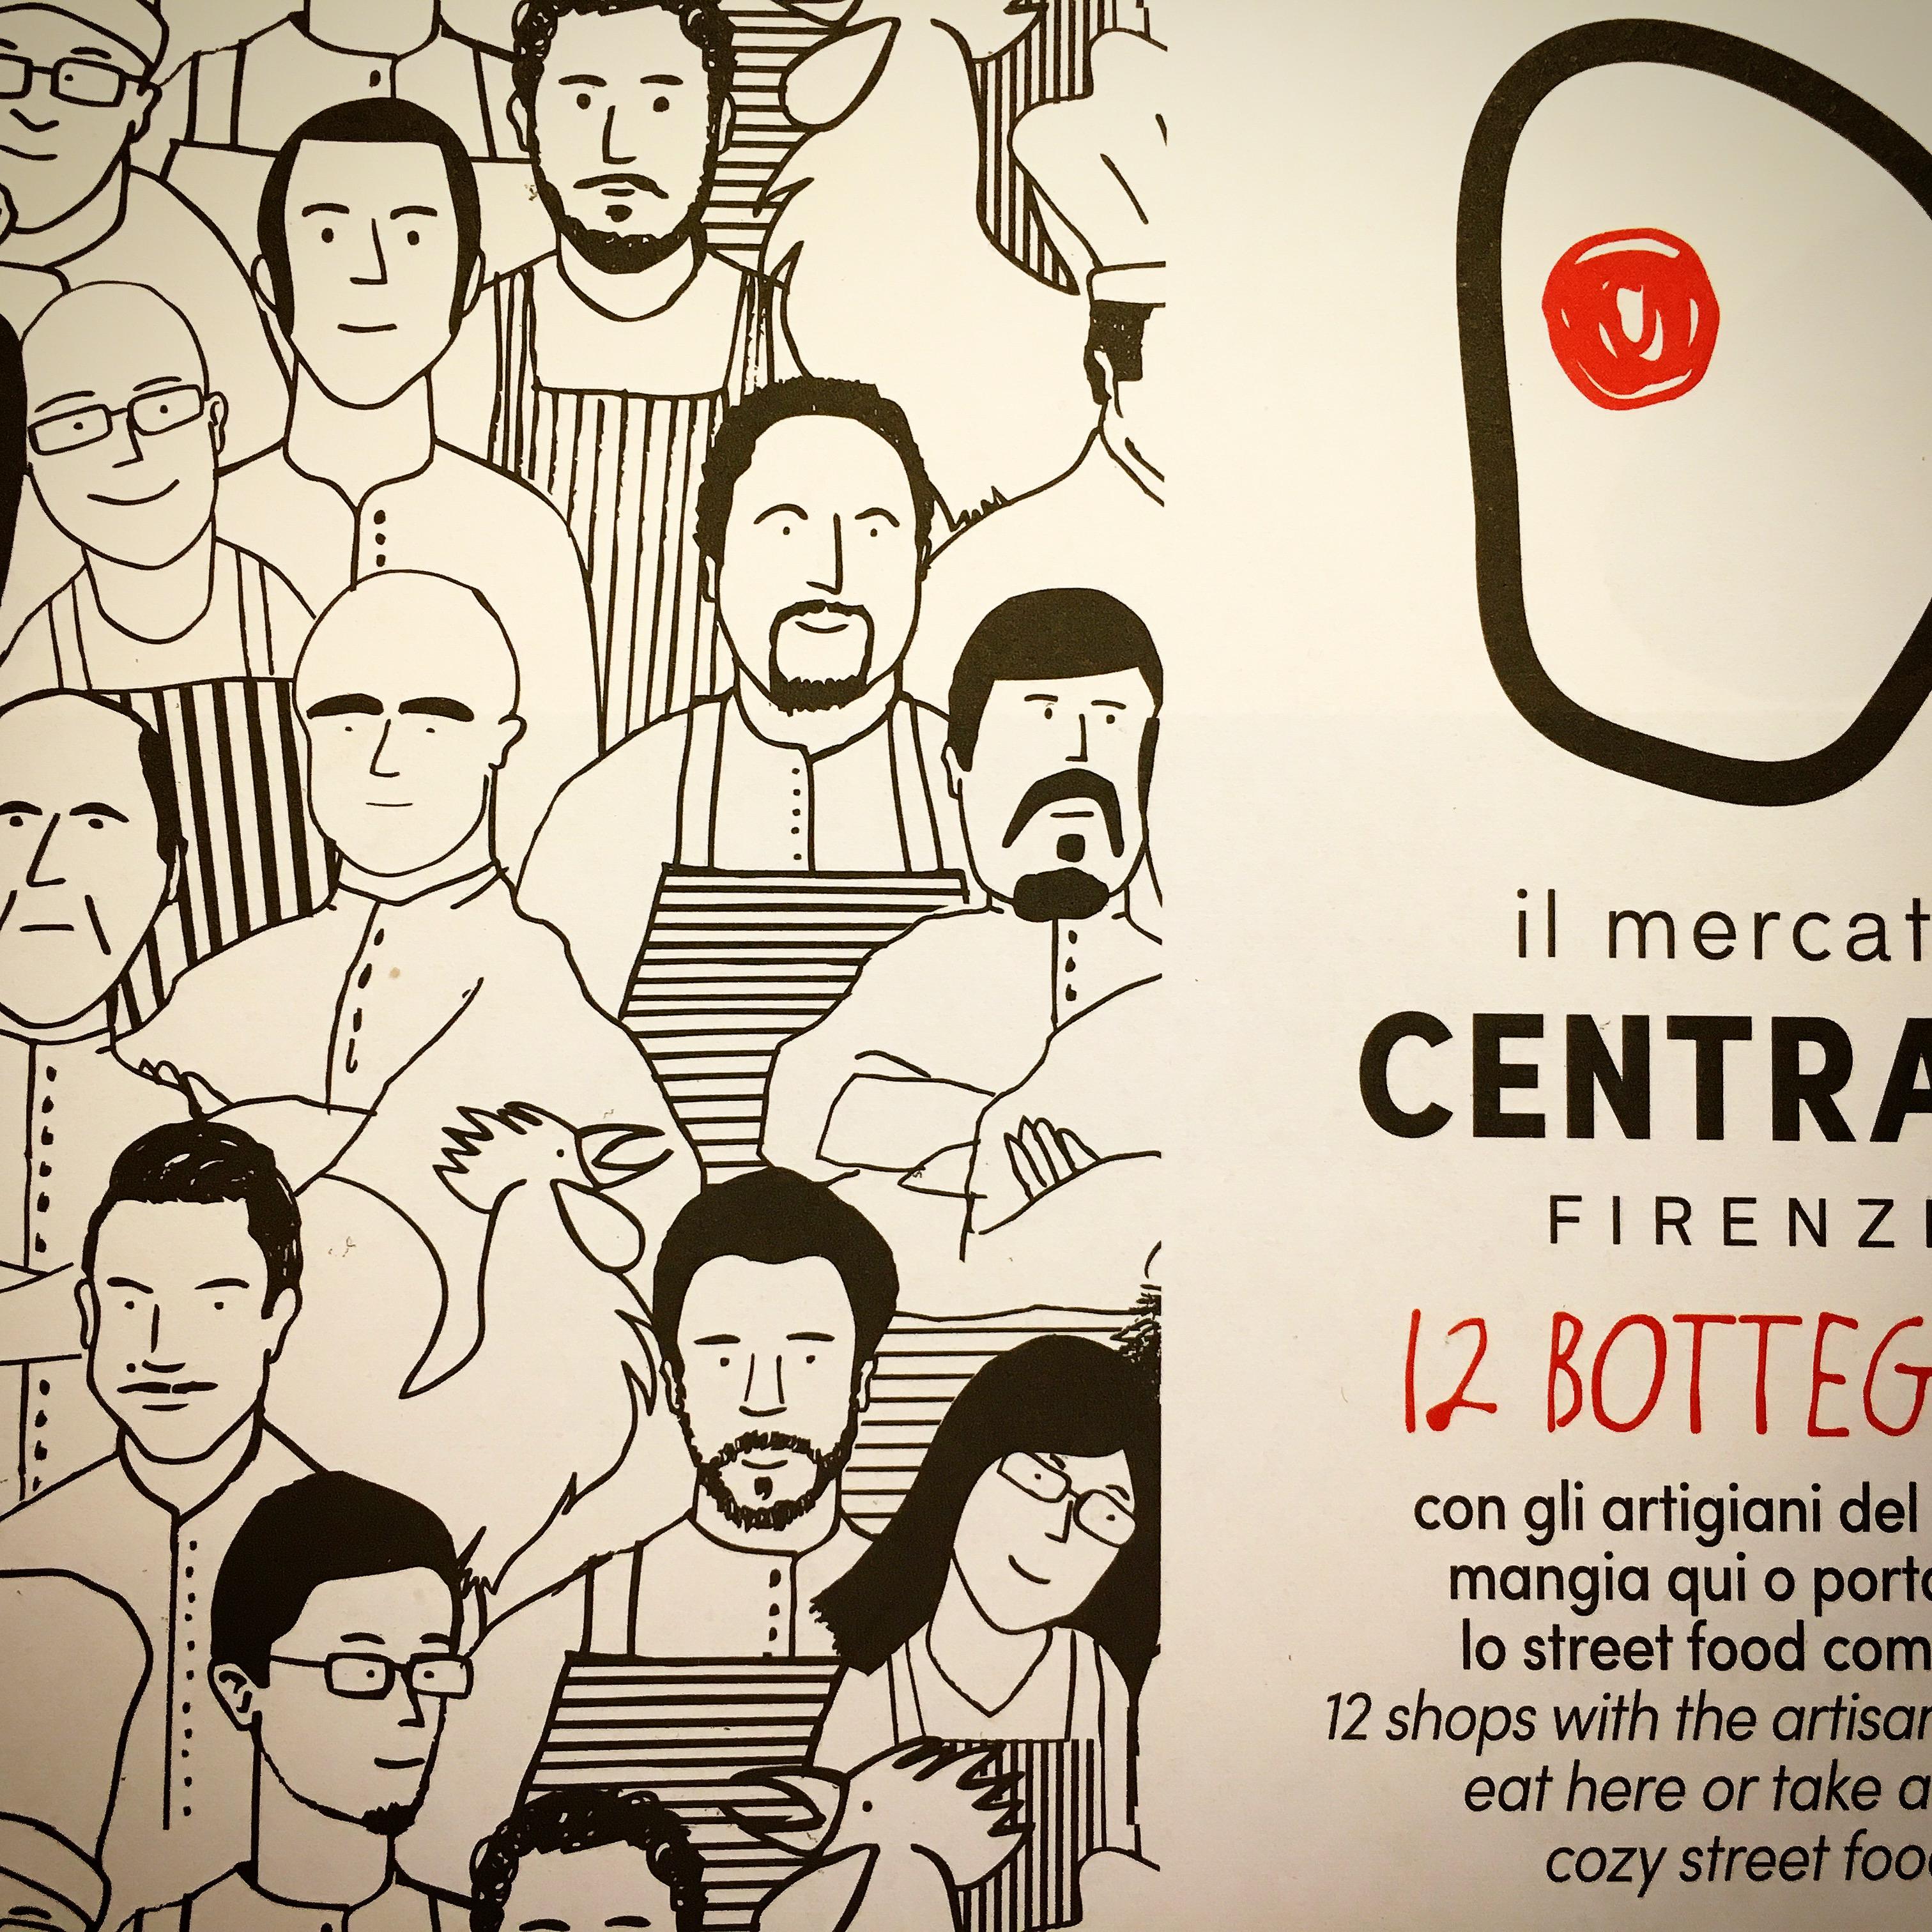 mercato-centrale-firenze-logo